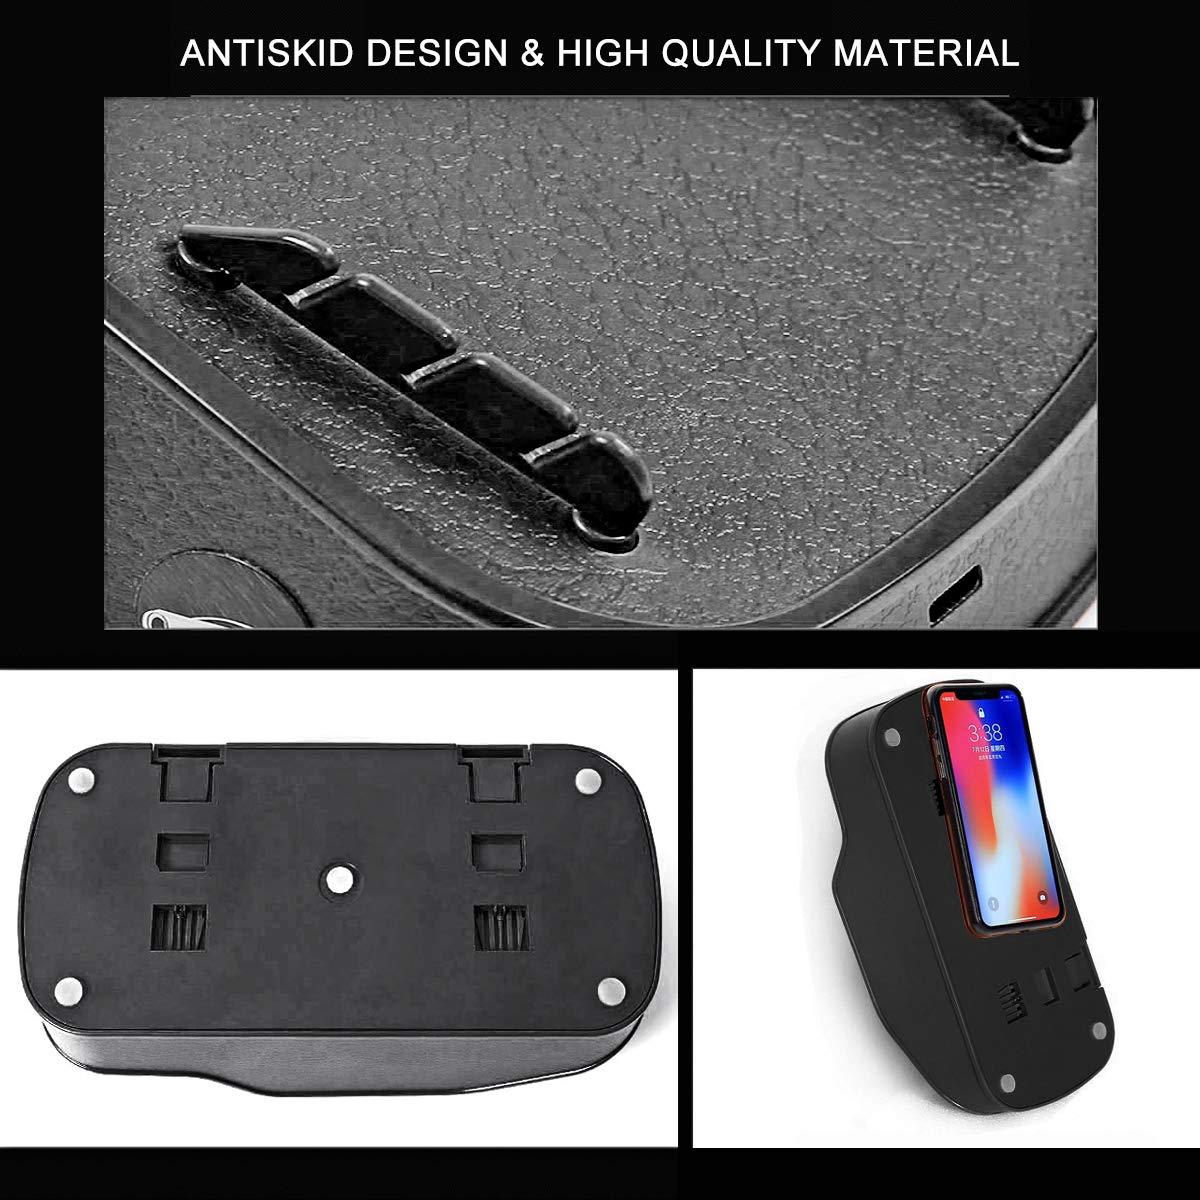 Dealpeak Car Tissue Box Phone Holder Multifunctional Car Organizer Phone Bracket Card Slots Holder Car Accesssorie Ornaments Black 4350410535